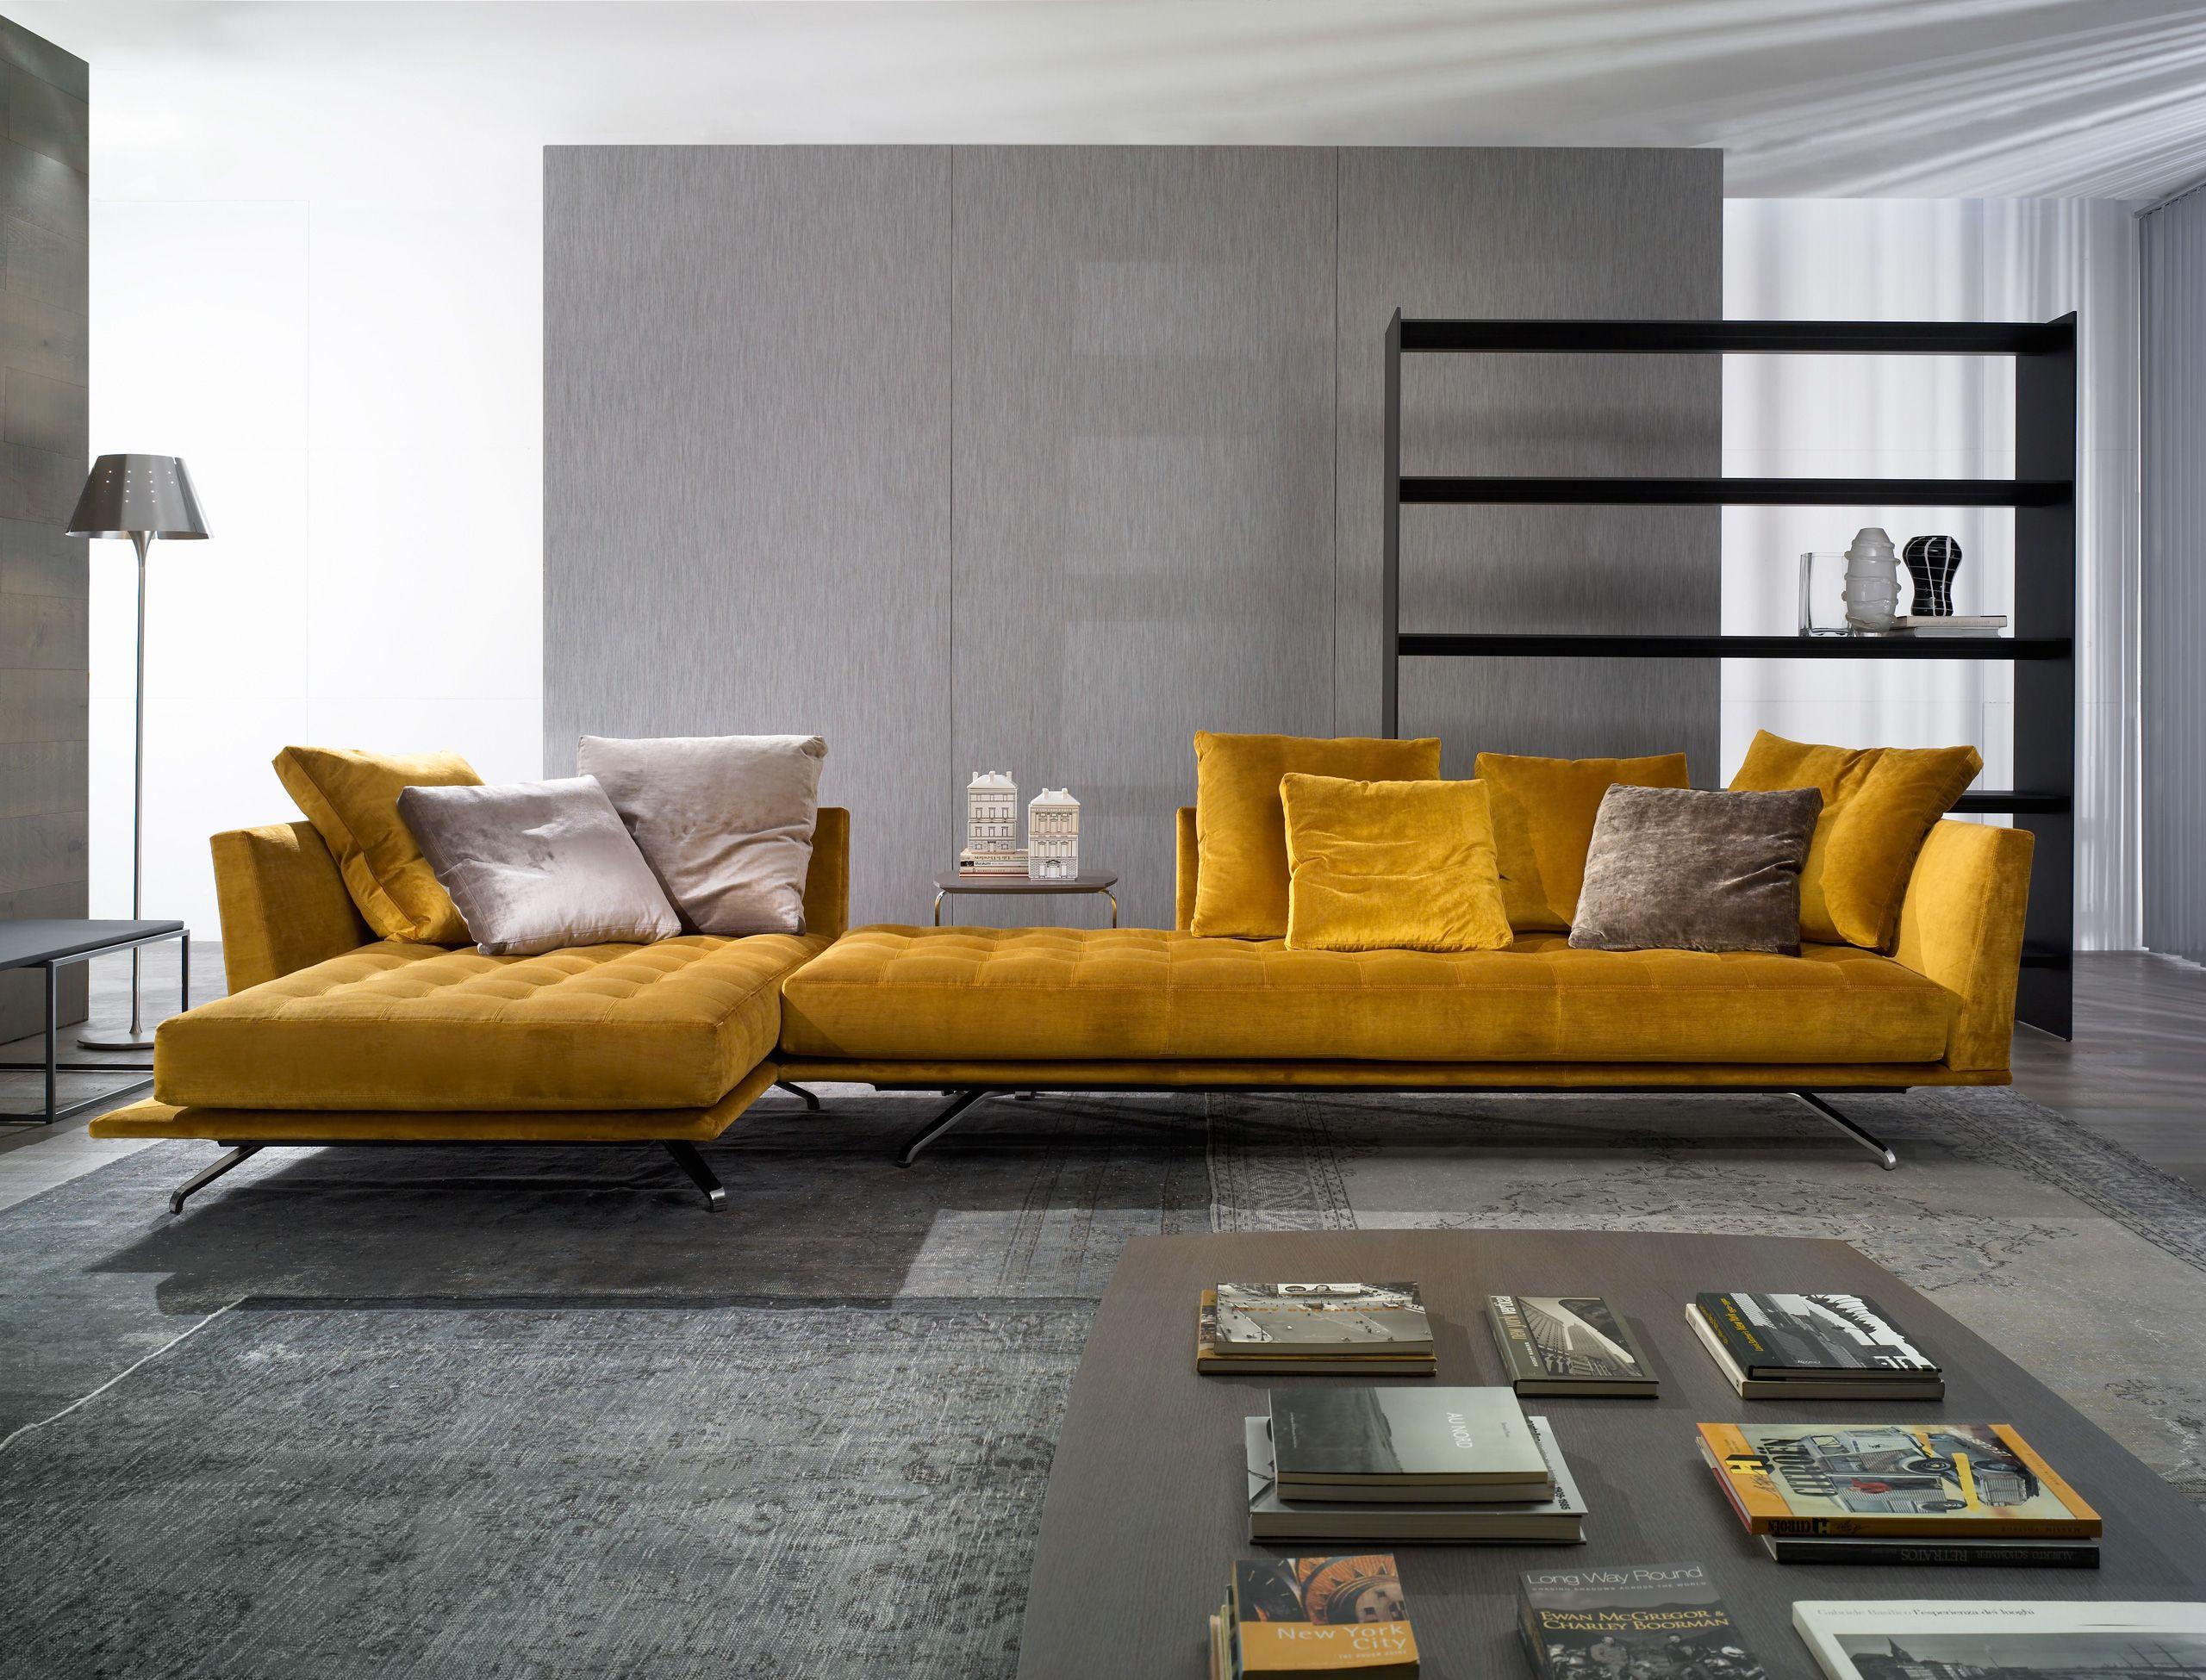 Casades s furniture design barcelona amparo y alvaro - Sofas diseno barcelona ...